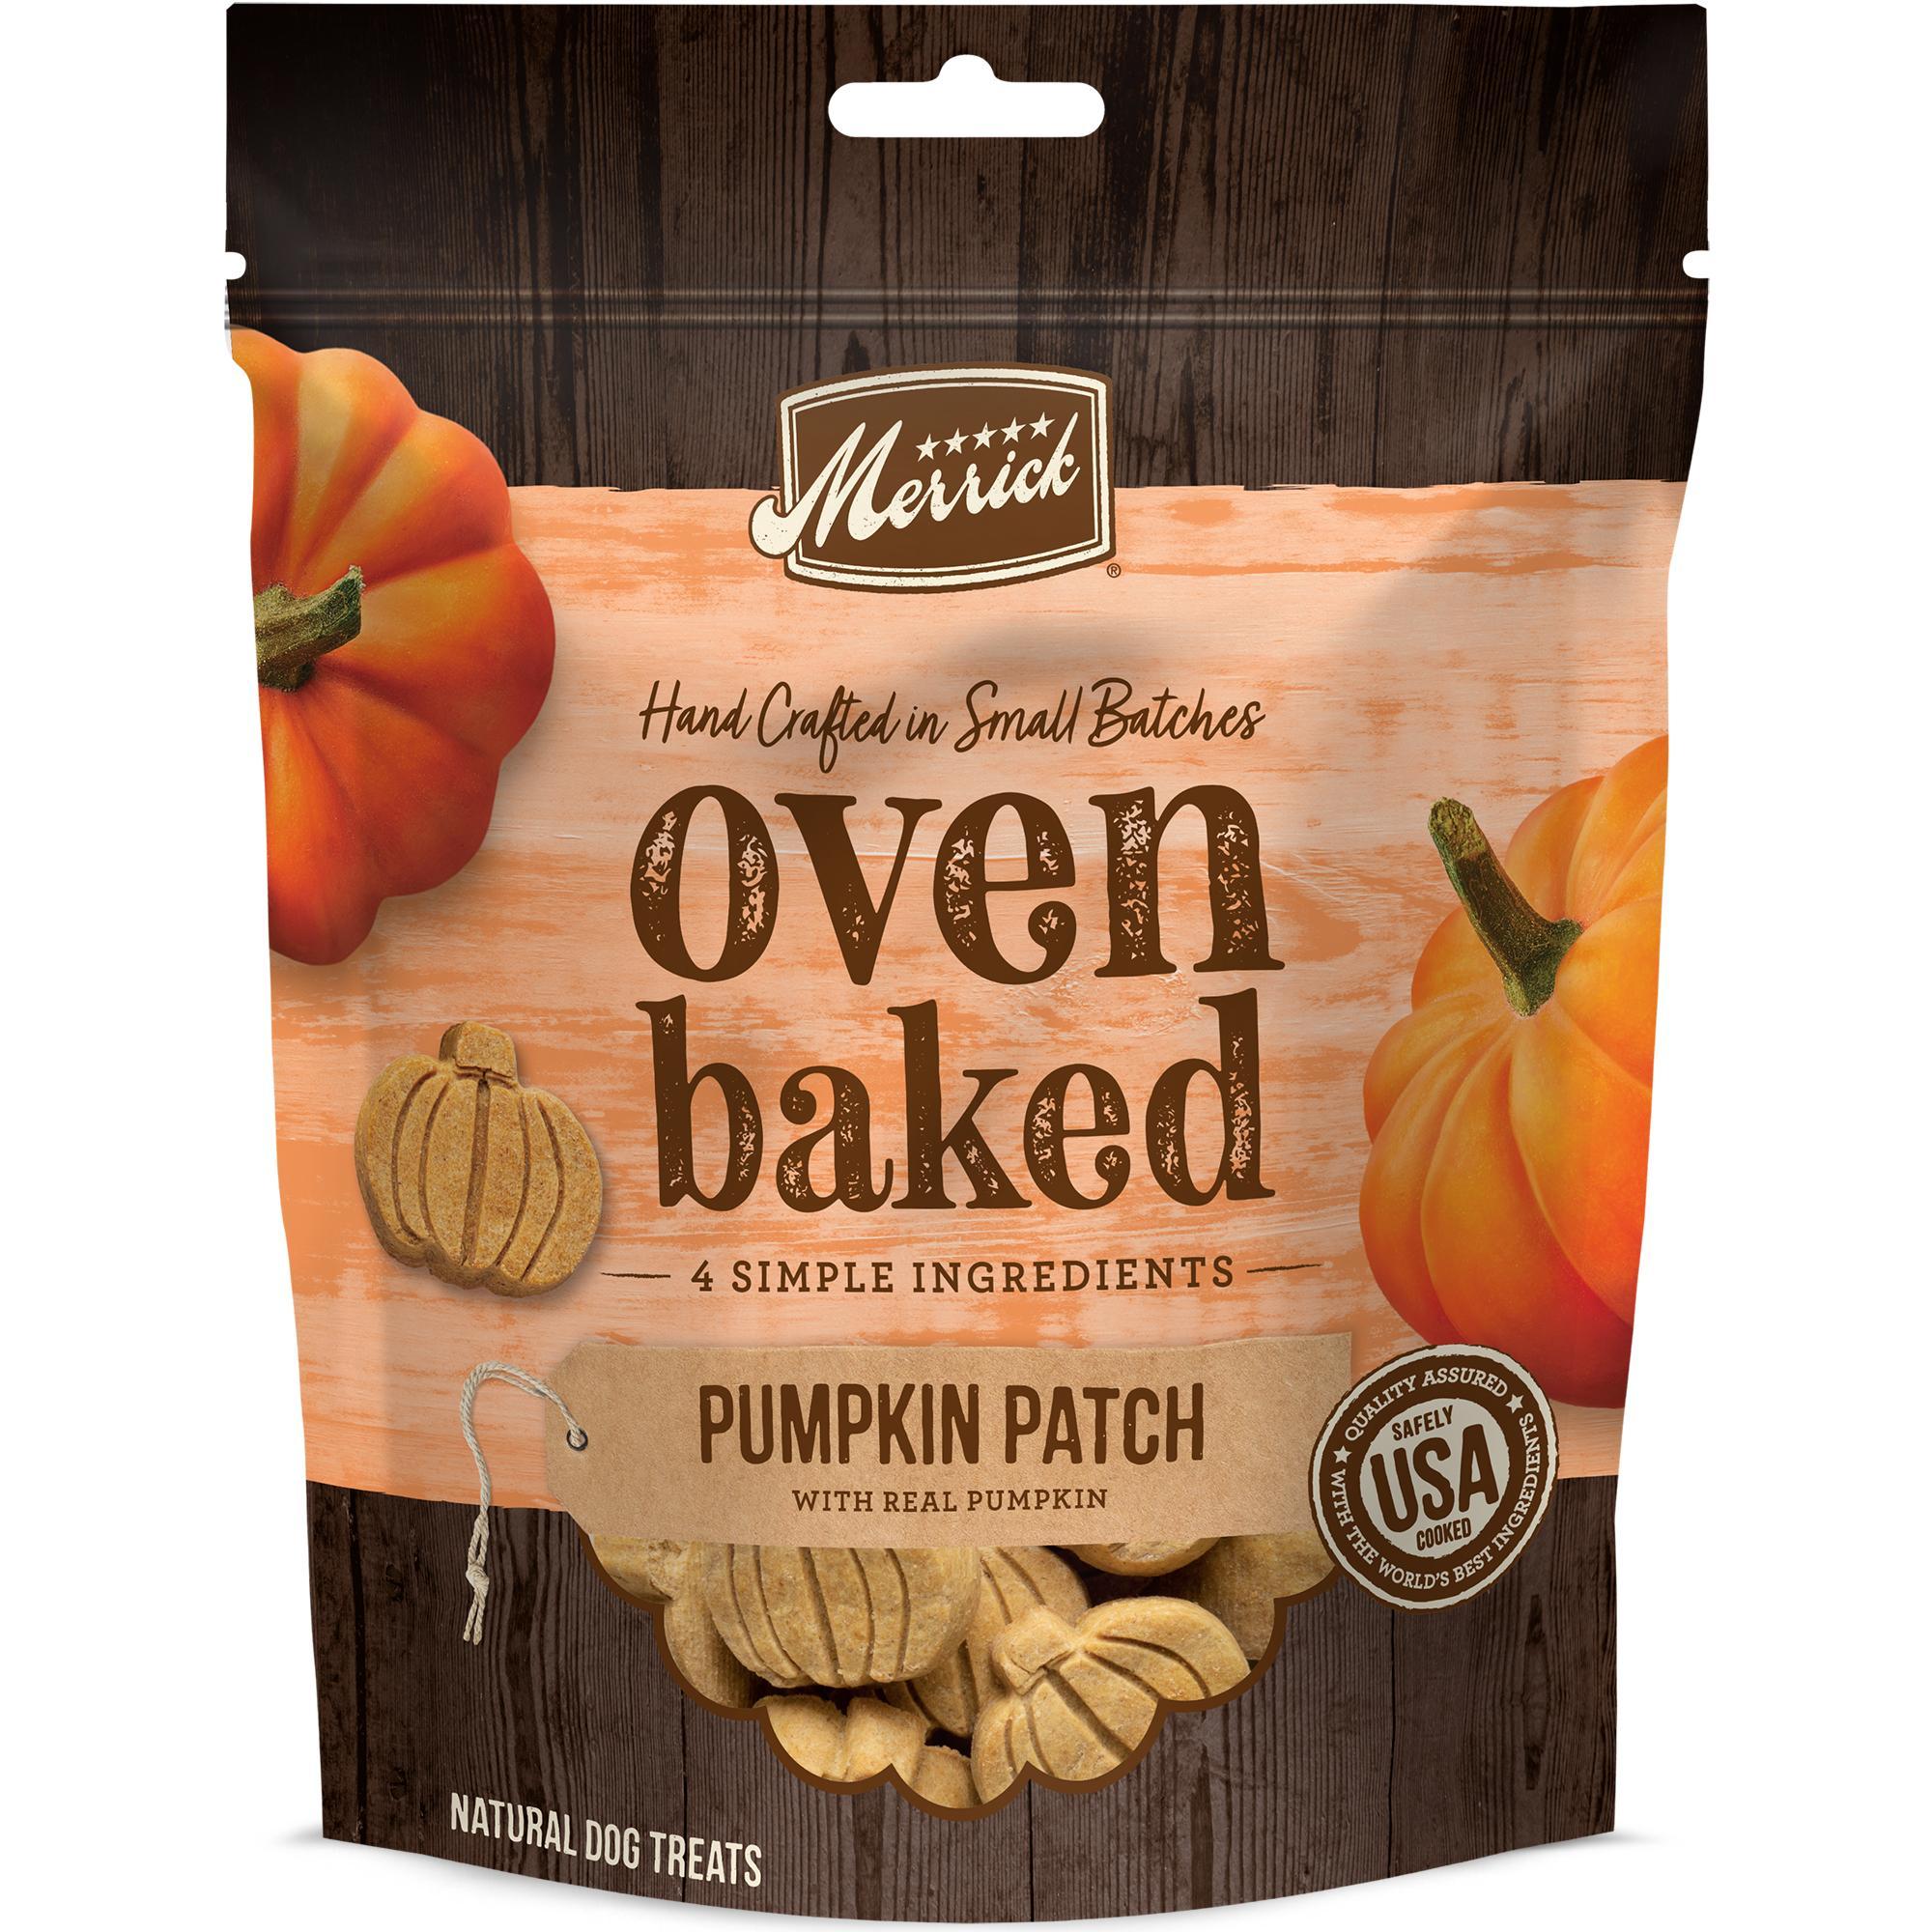 Merrick Oven Baked Pumpkin Patch Dog Treats Image